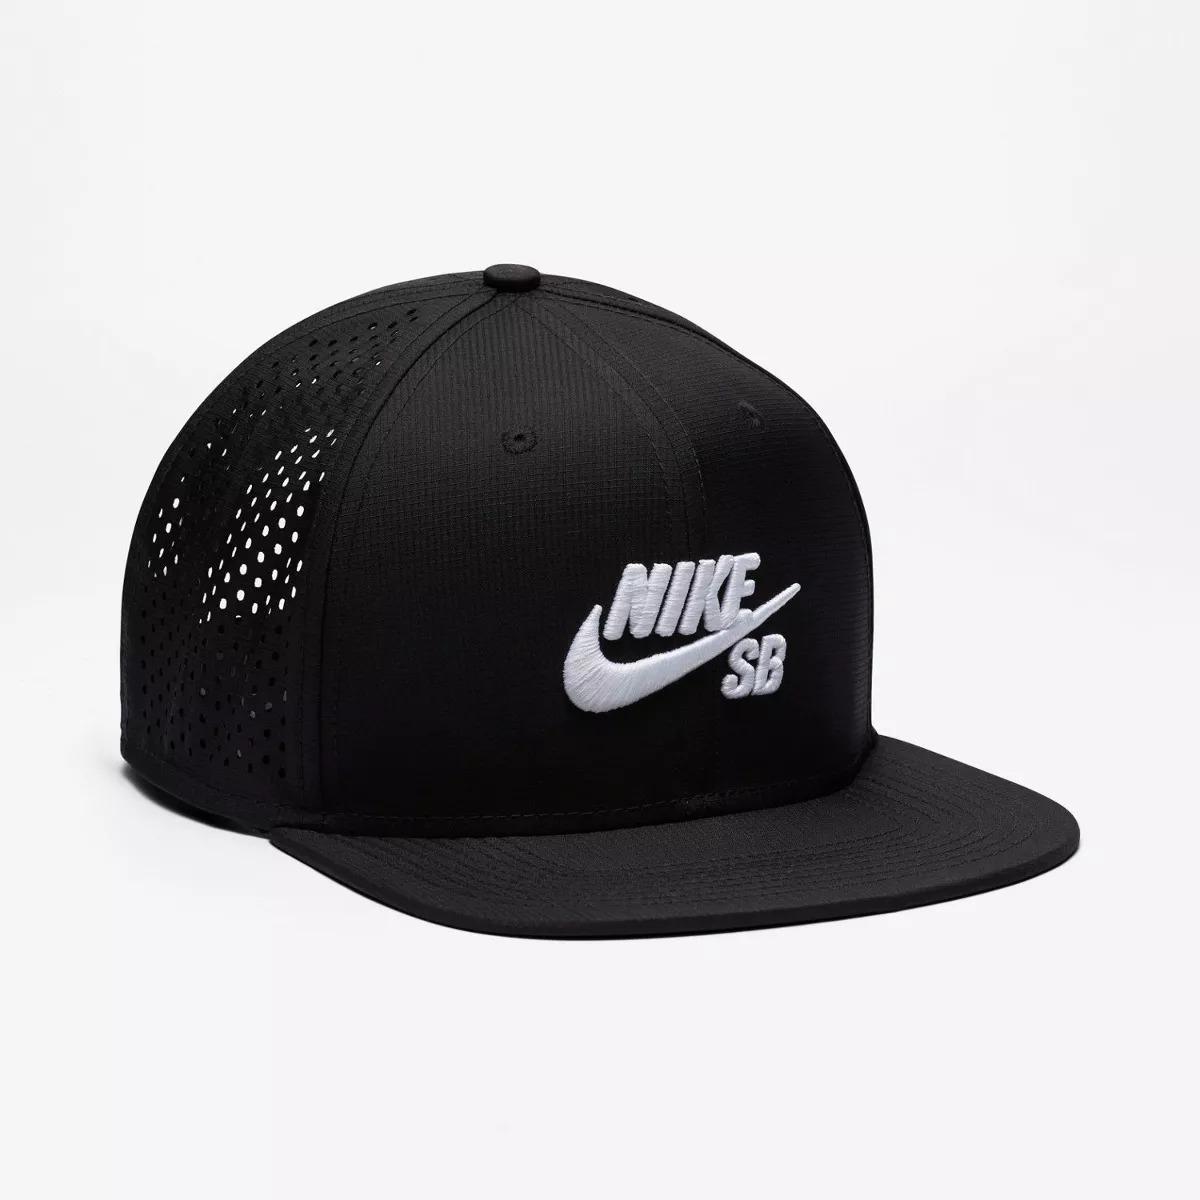 Gorra Nike Sb Performance Trucker 100% Original.negro -   1.299 1e318d6b800